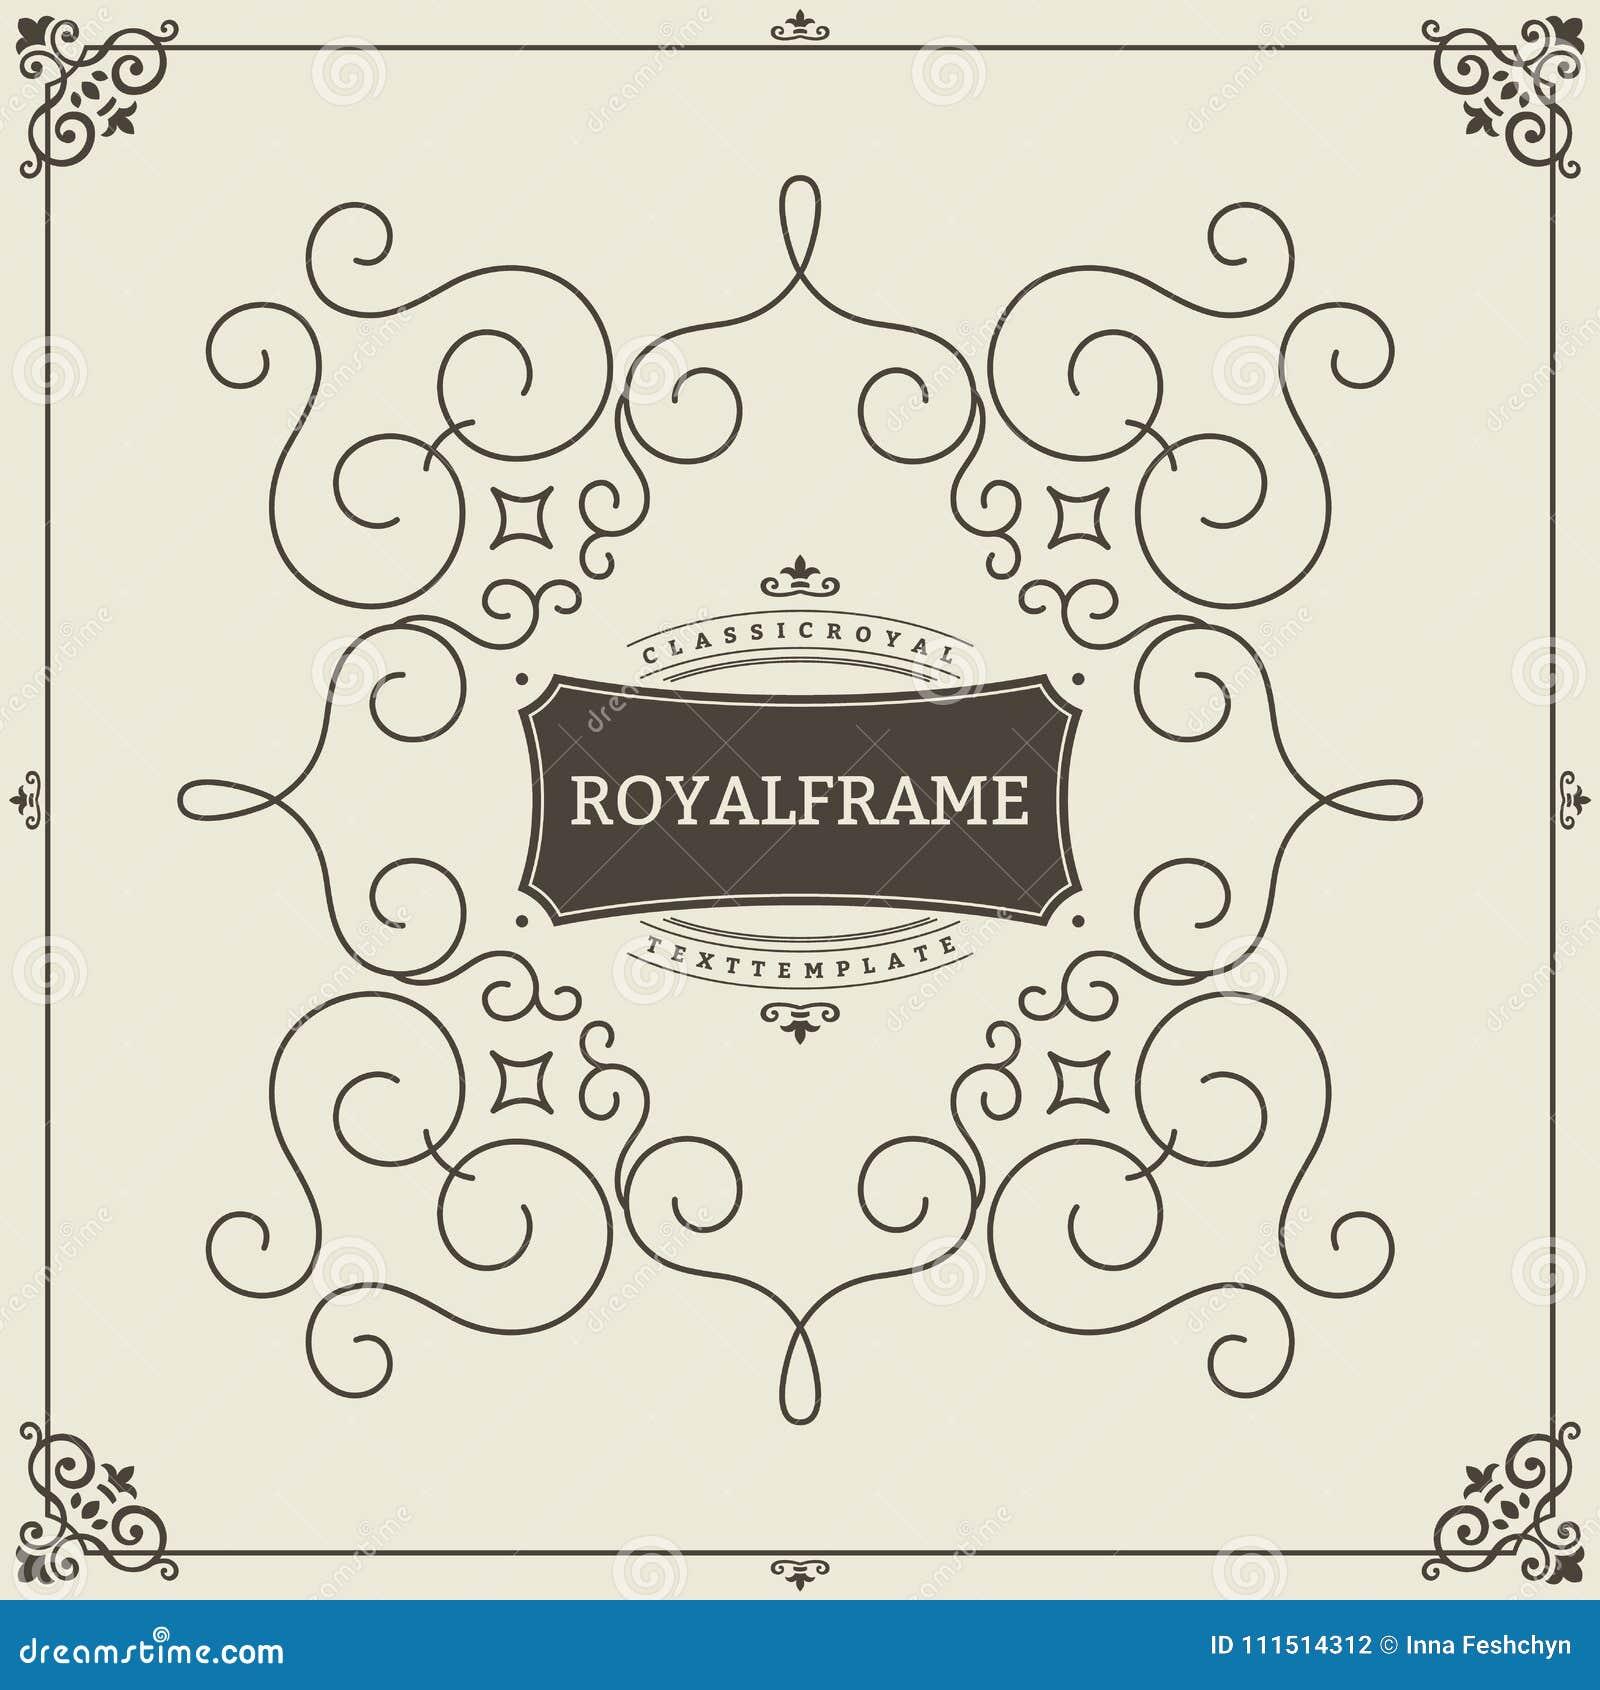 Ornament design invitation template. Vector flourishes calligraphic vintage frame. Good for Luxury, boutique brand